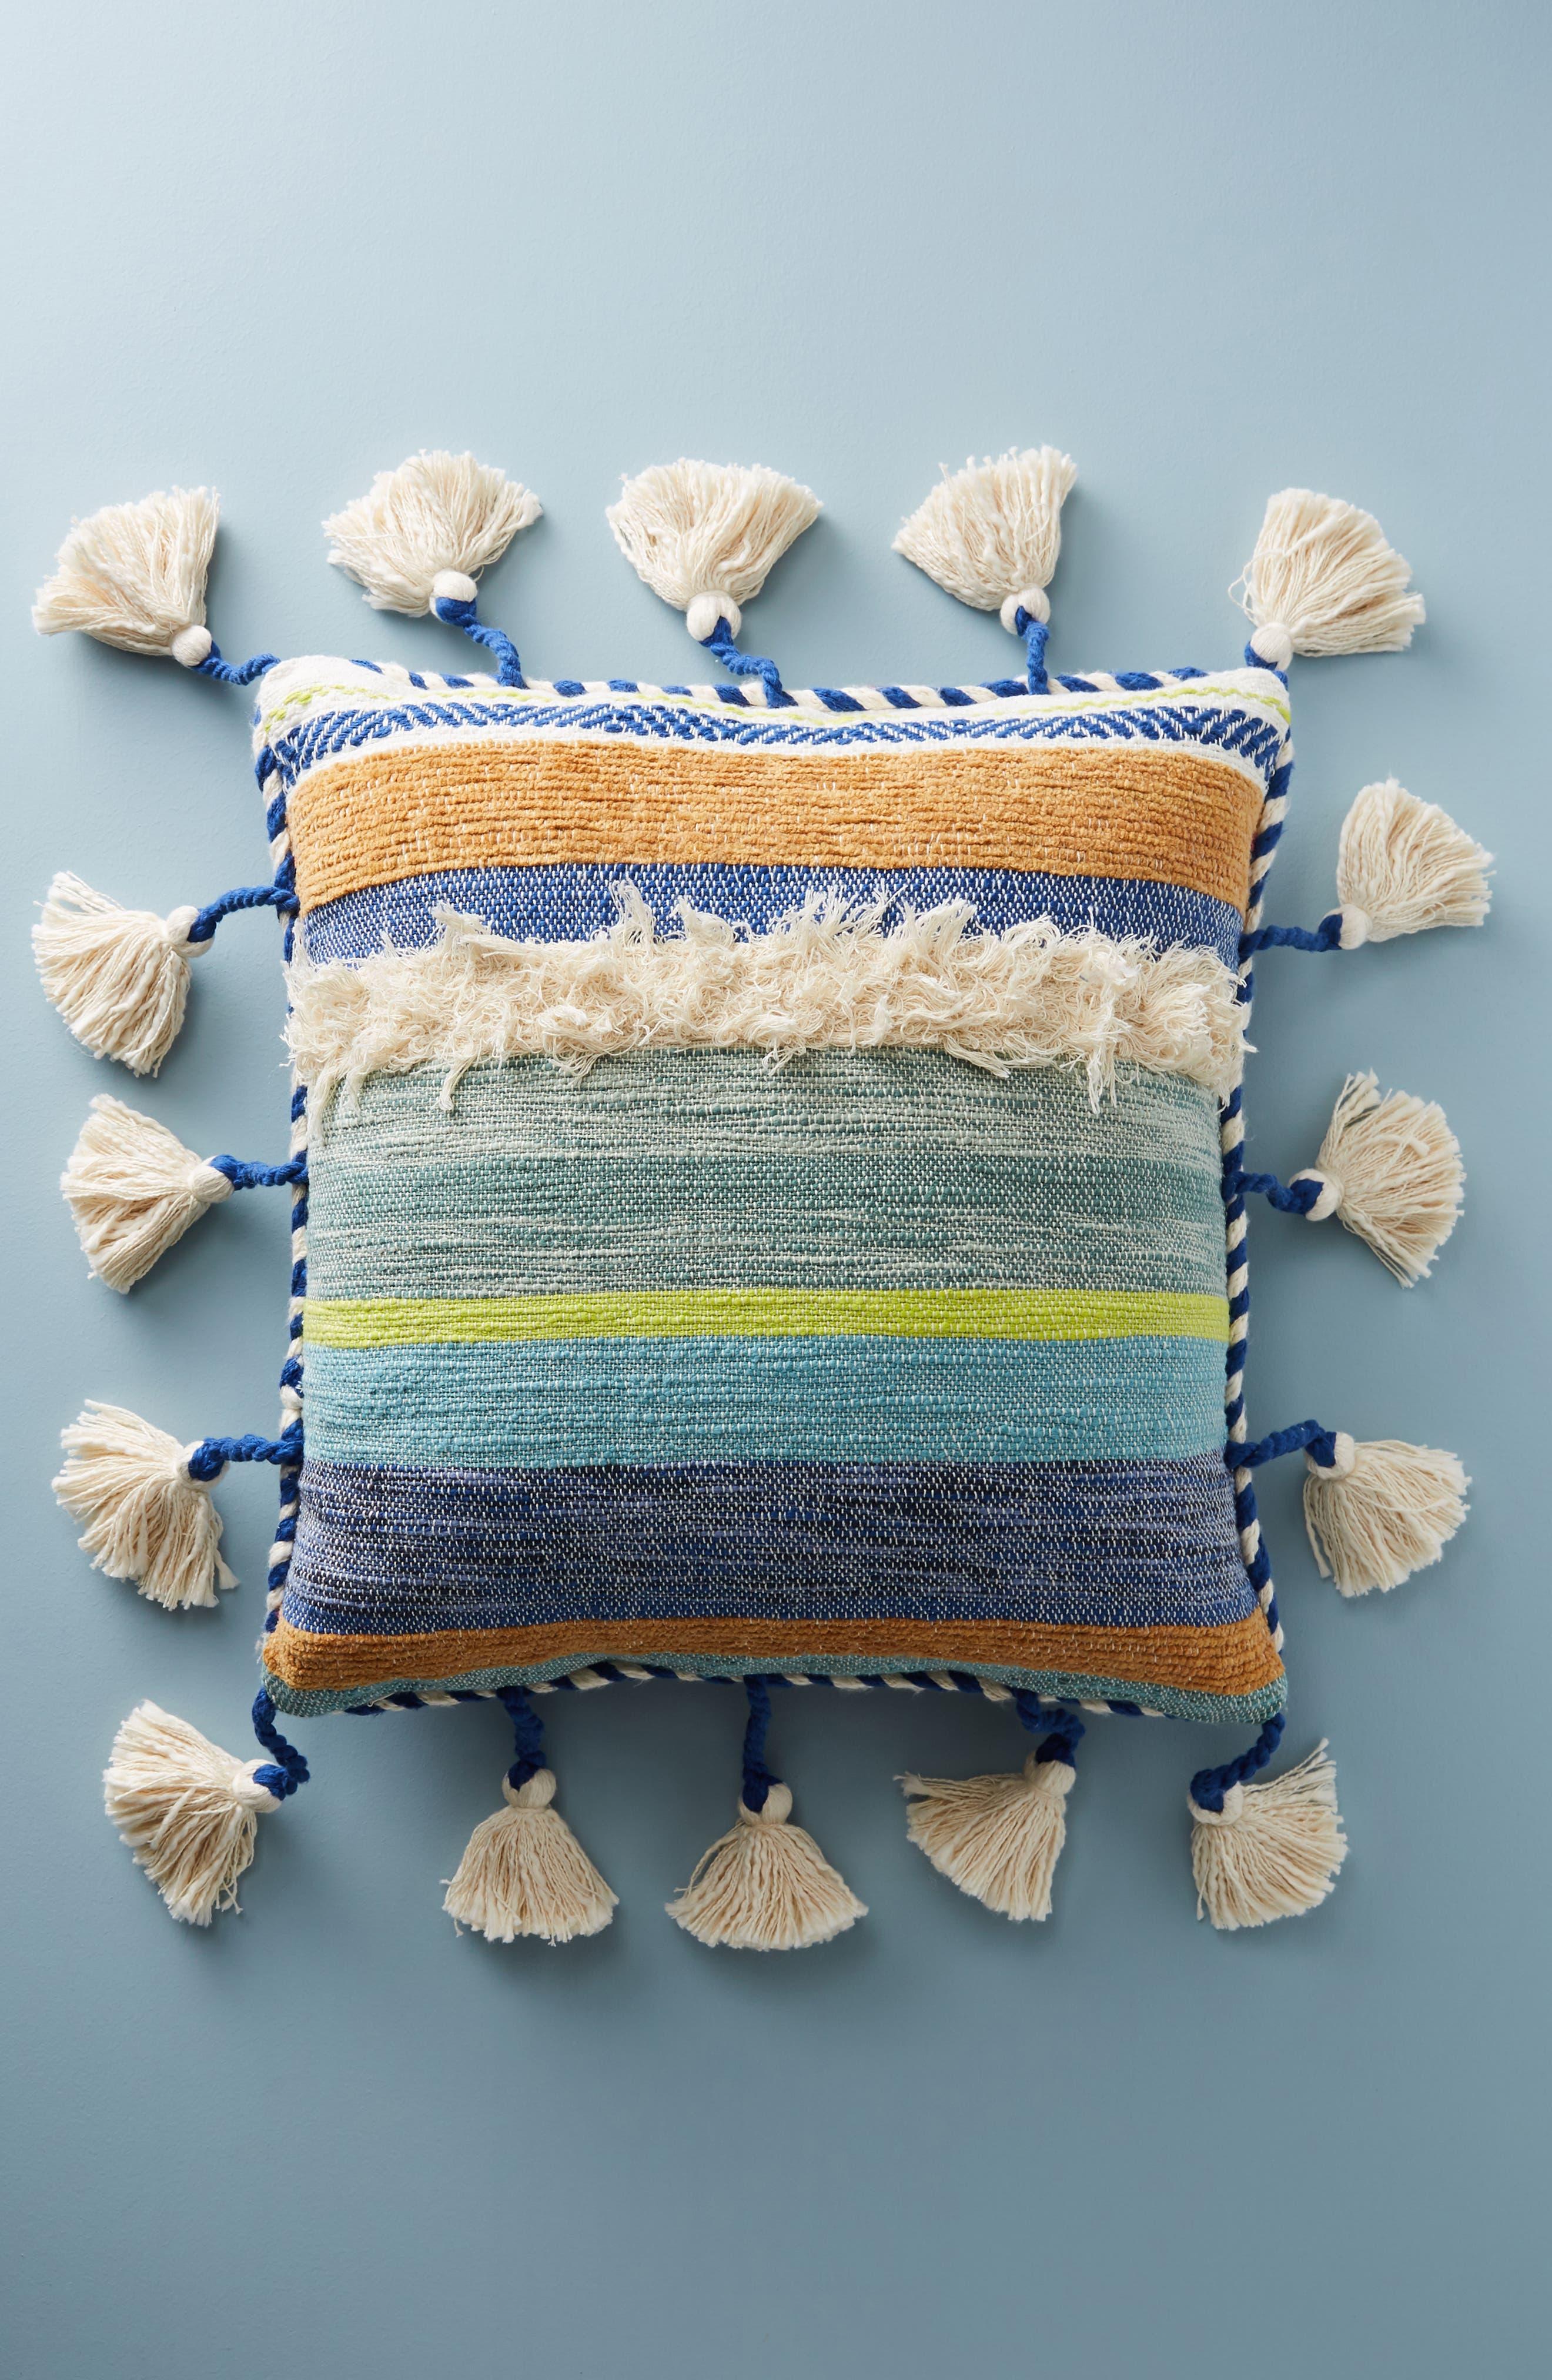 Woven Rami Accent Pillow,                             Alternate thumbnail 2, color,                             Blue Combo